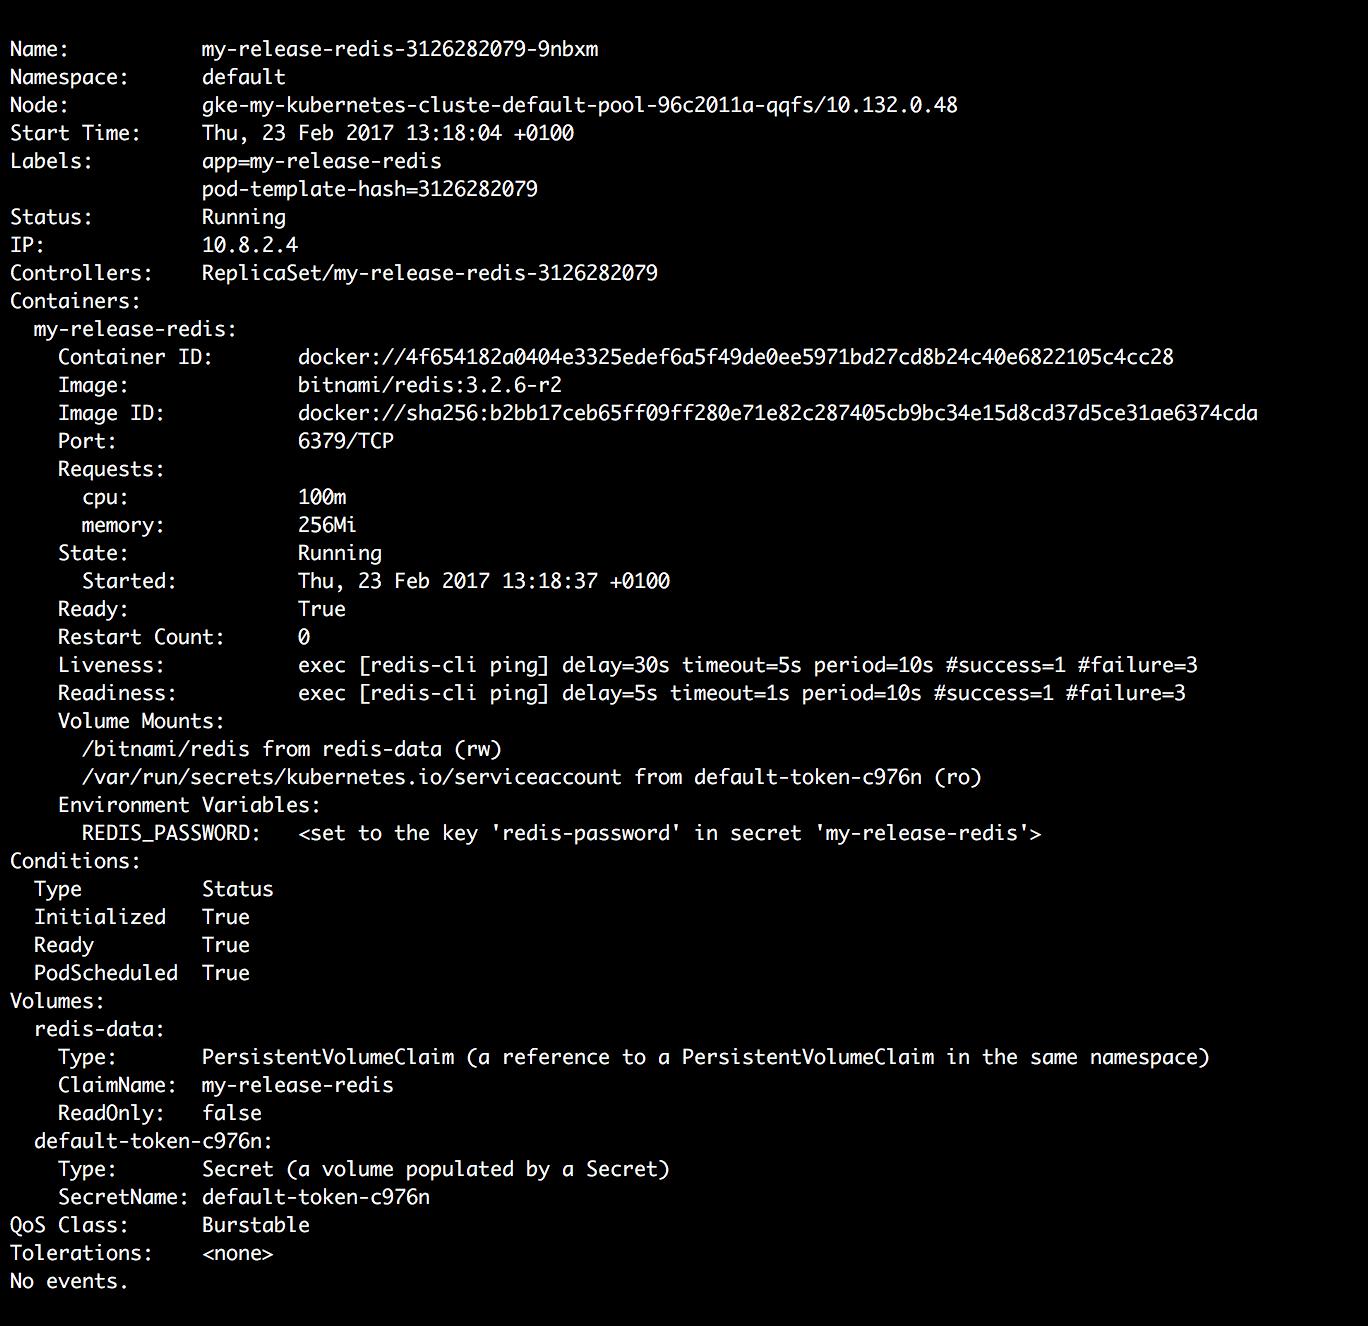 Check Kubernetes node info